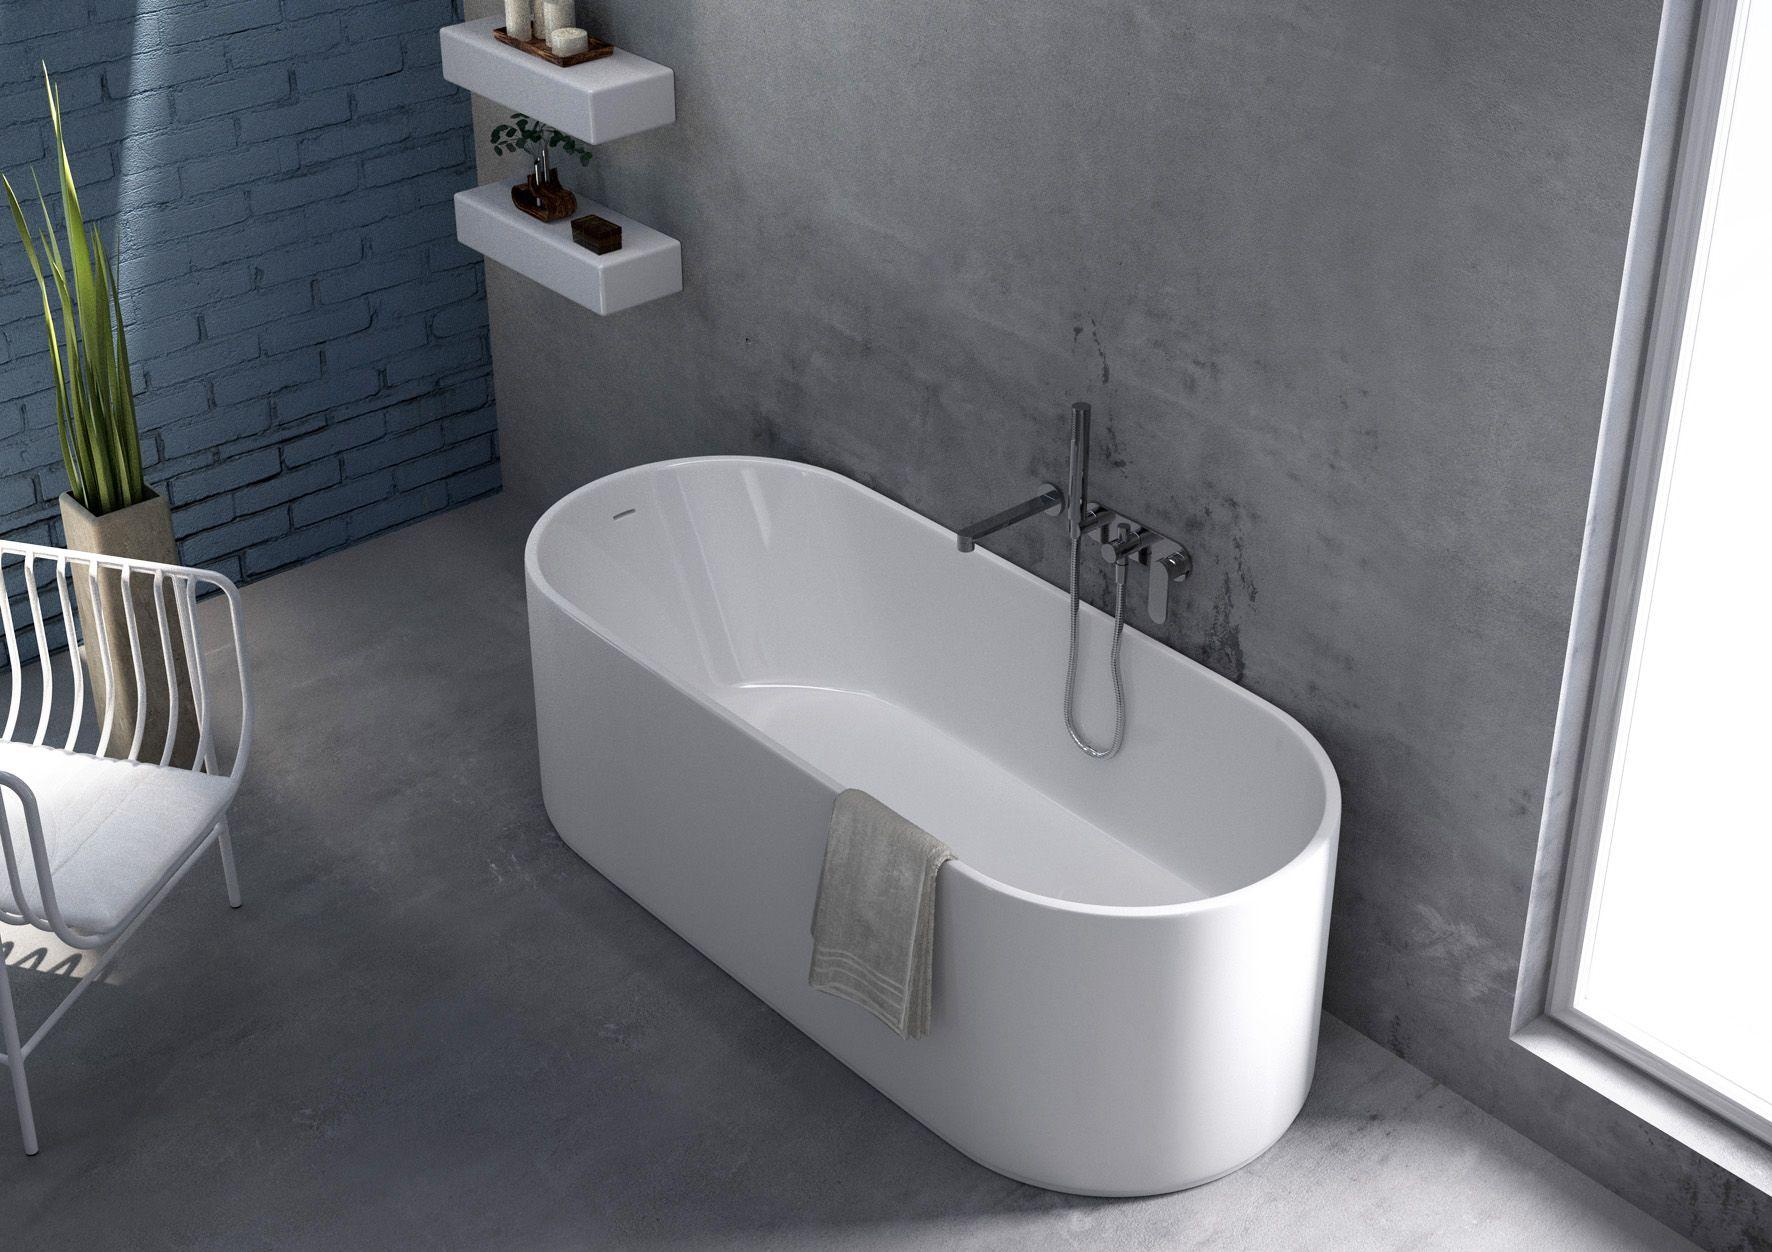 Vasca Da Bagno Ovale : Vasca da bagno ovale in pietraluce oval linea oval by ceramica